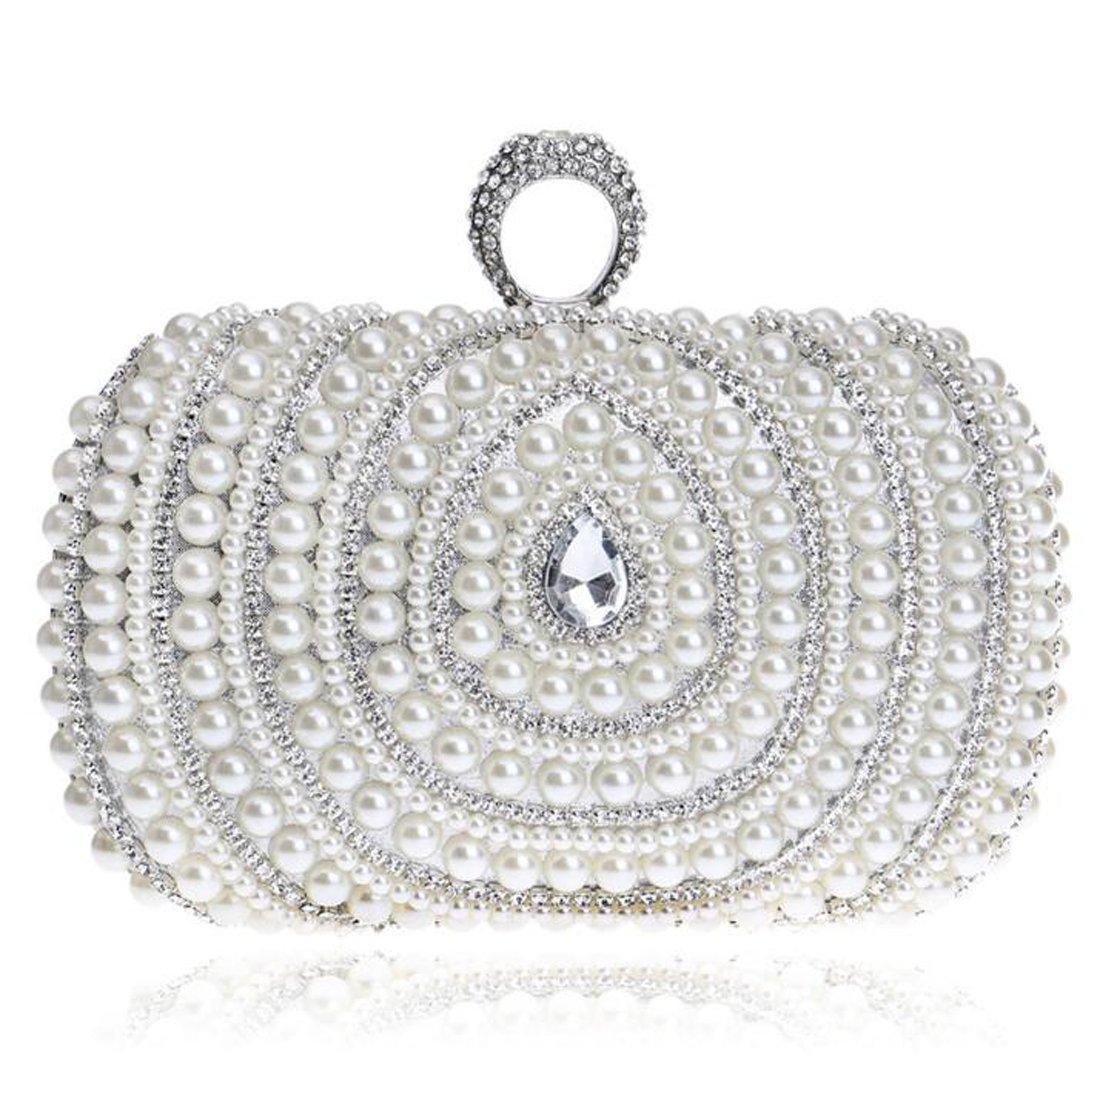 EPLAZA Women Rhinestone Beaded One Ring Evening Clutch Bags Handbags Bridal Wedding Party Purse (A)